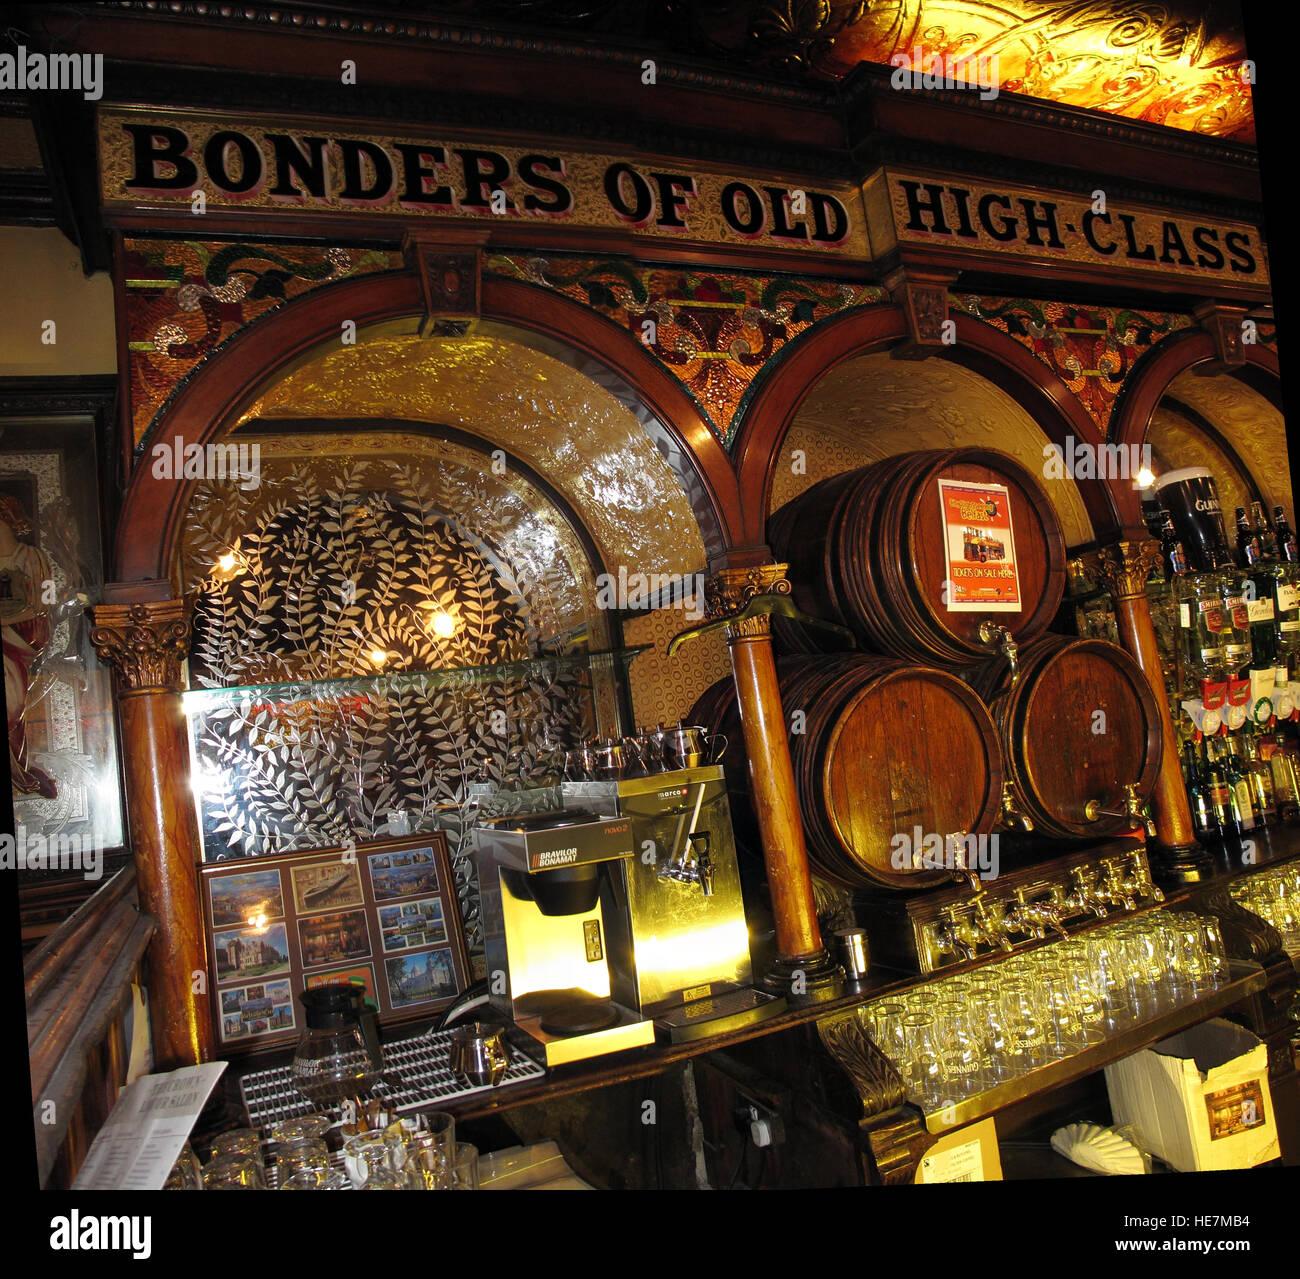 Laden Sie dieses Alamy Stockfoto Famous Crown Bar Spiegel, Gt Victoria St, Belfast - HE7MB4